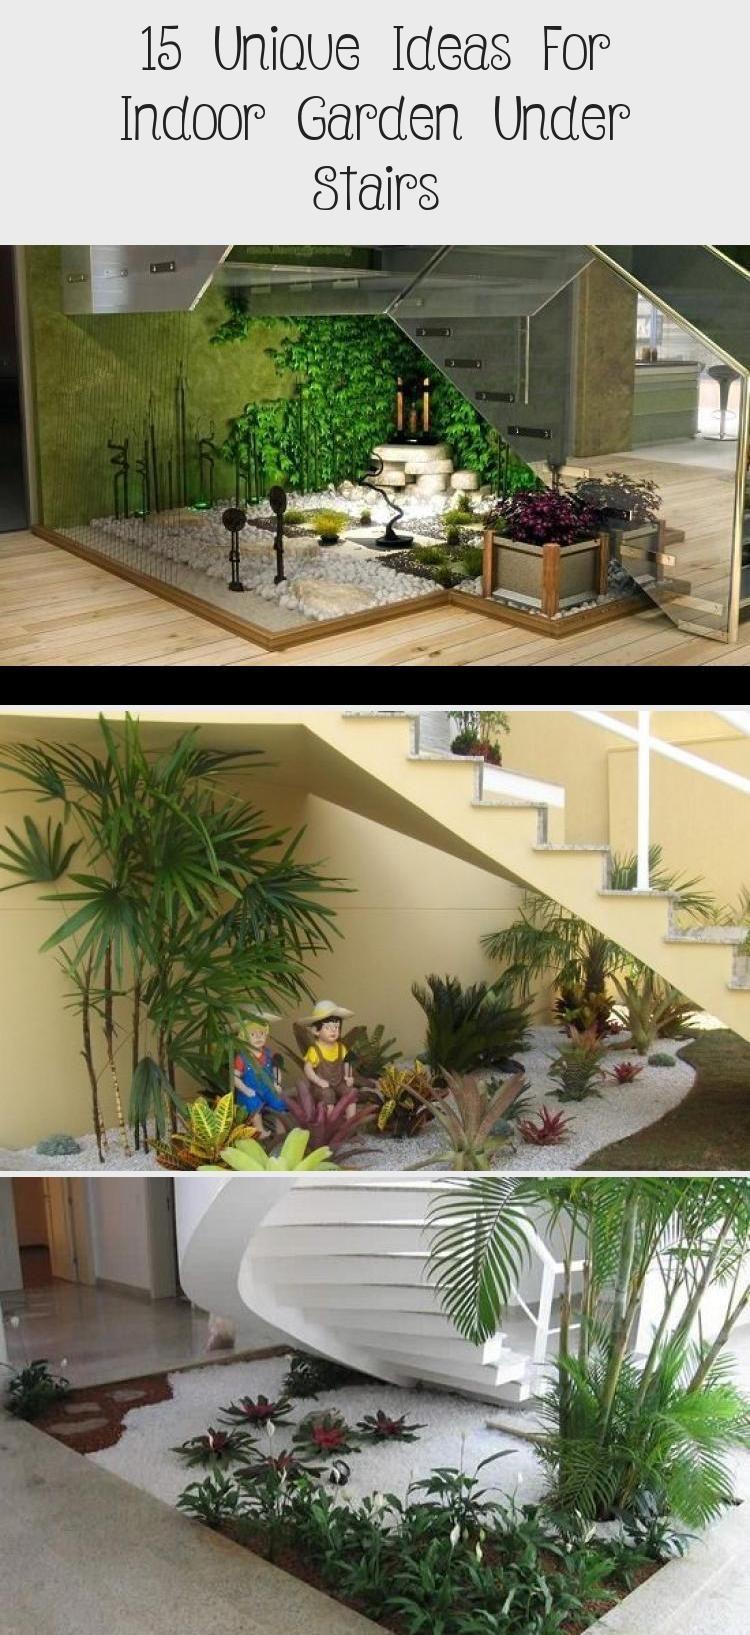 My Blog En Blog In 2020 Indoor Garden Under Stairs Fake Plants Decor